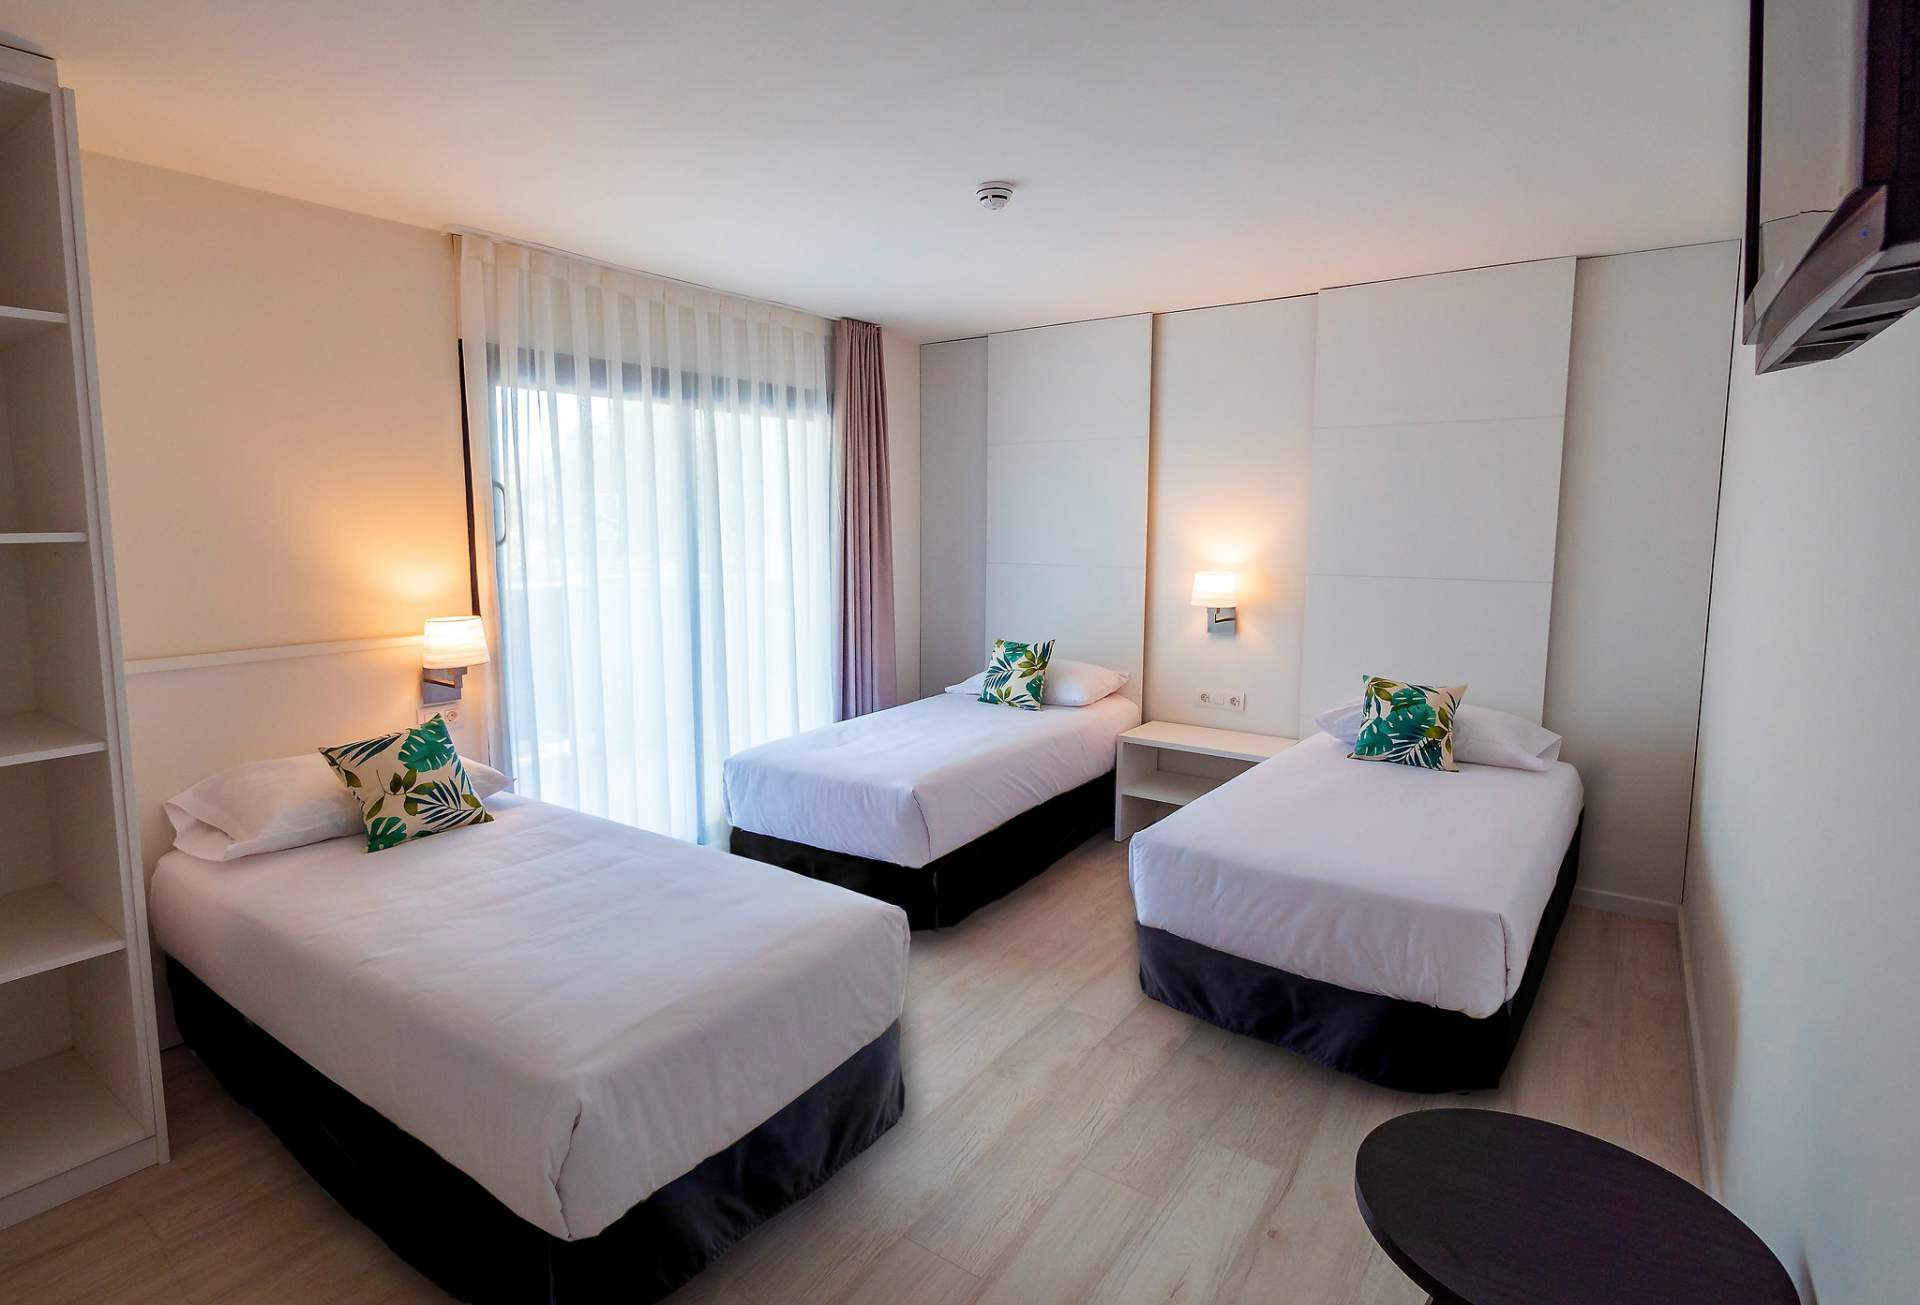 Busreis Salou Hotel Golden Port Salou en Spa strandvakantie